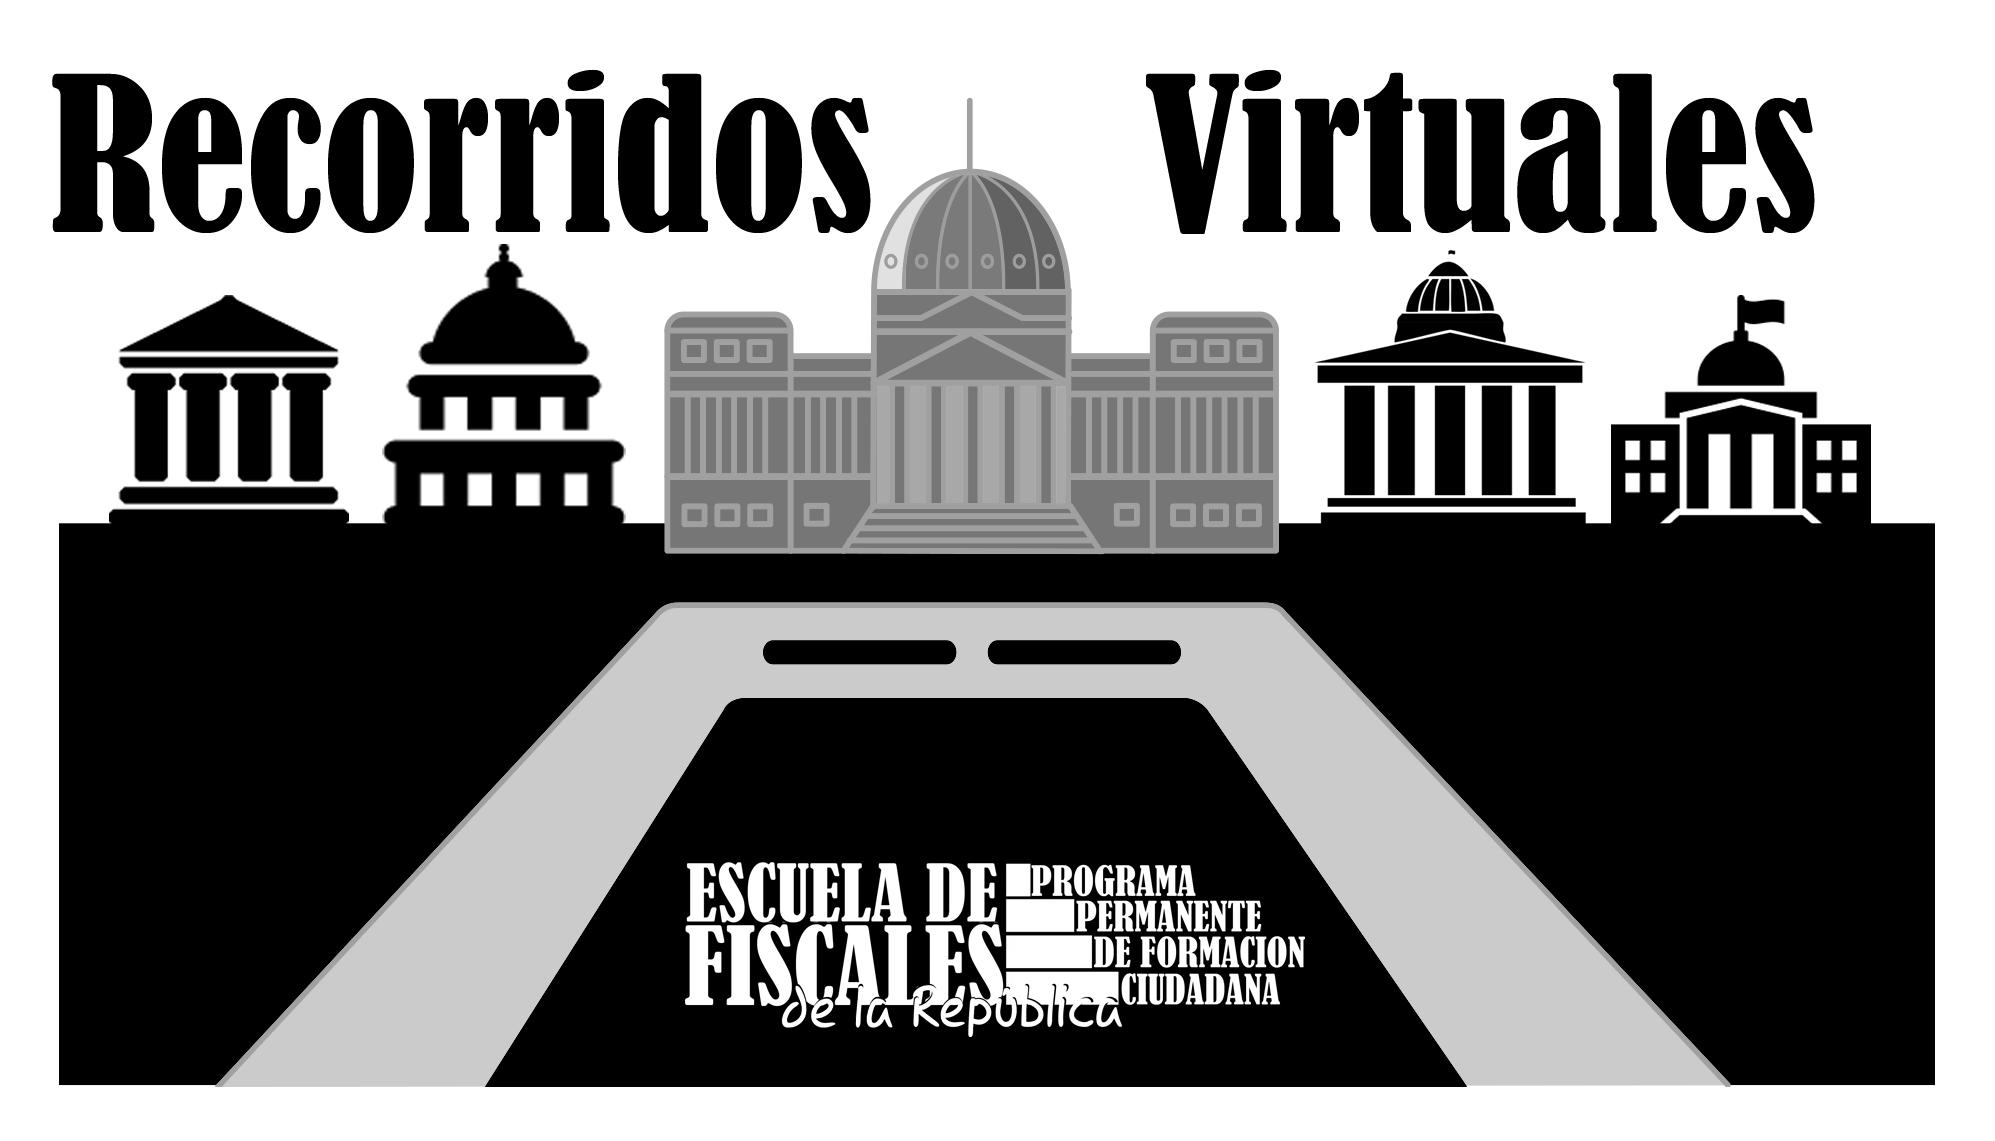 recorridos virtuales logo